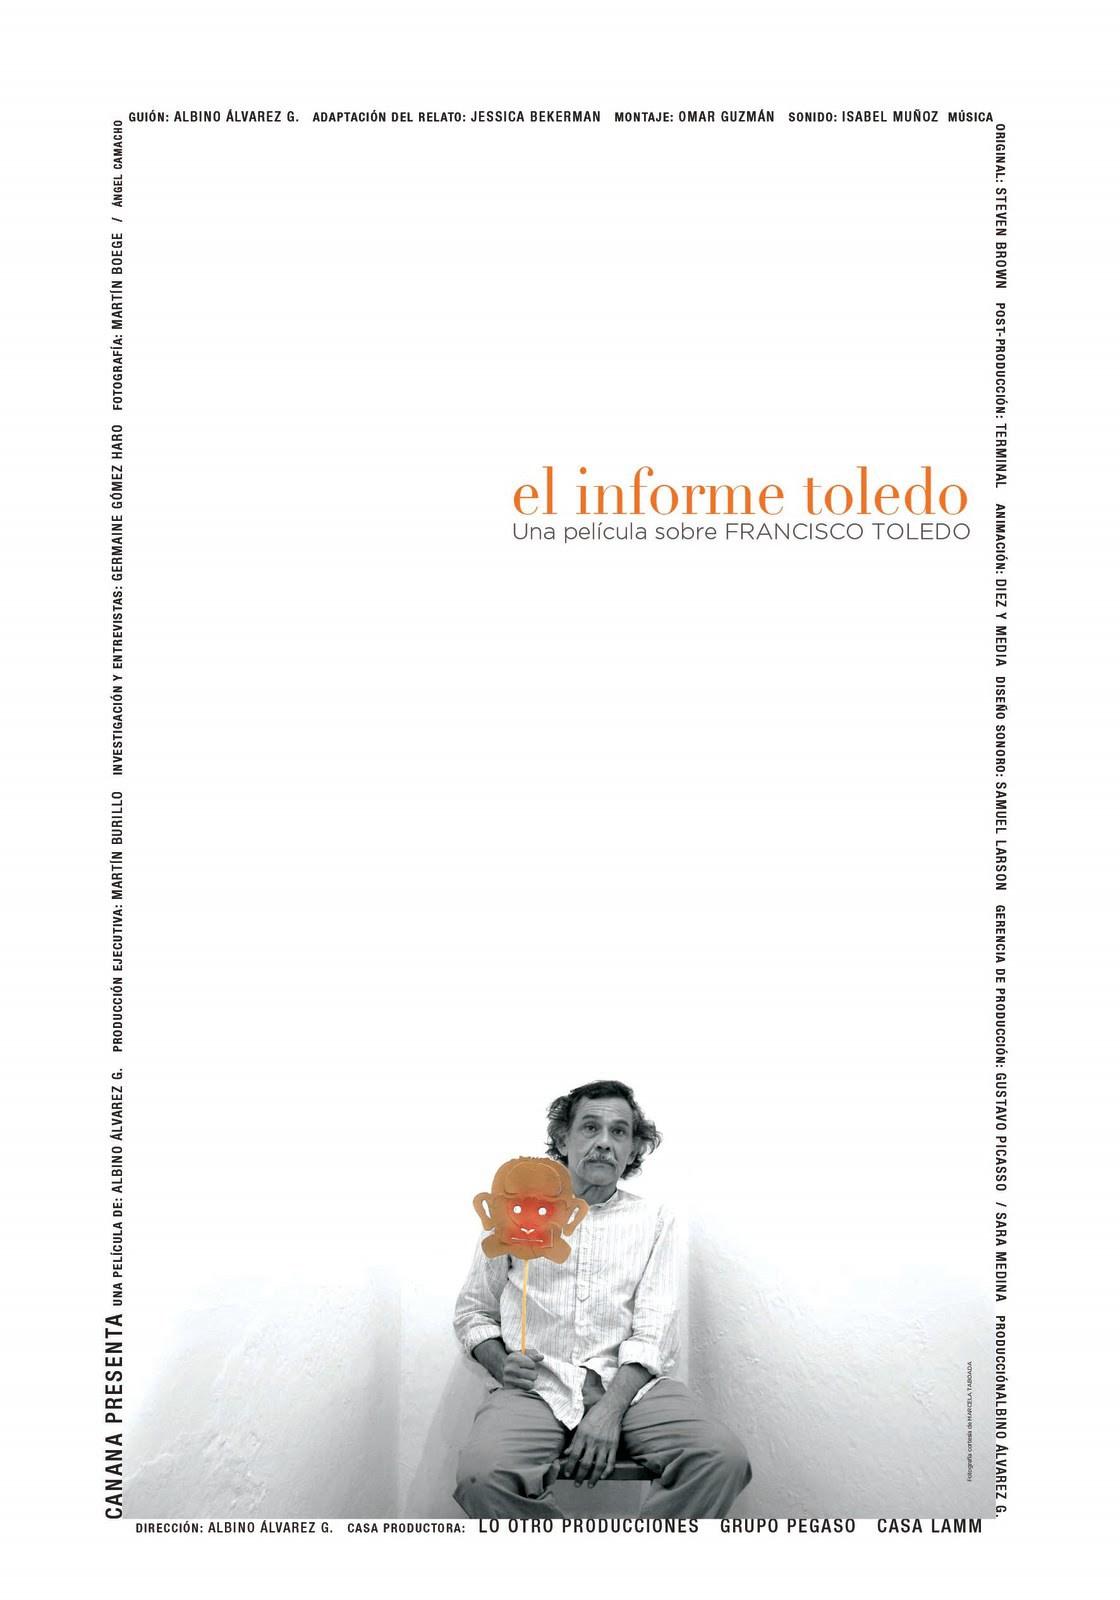 El Informe Toledo